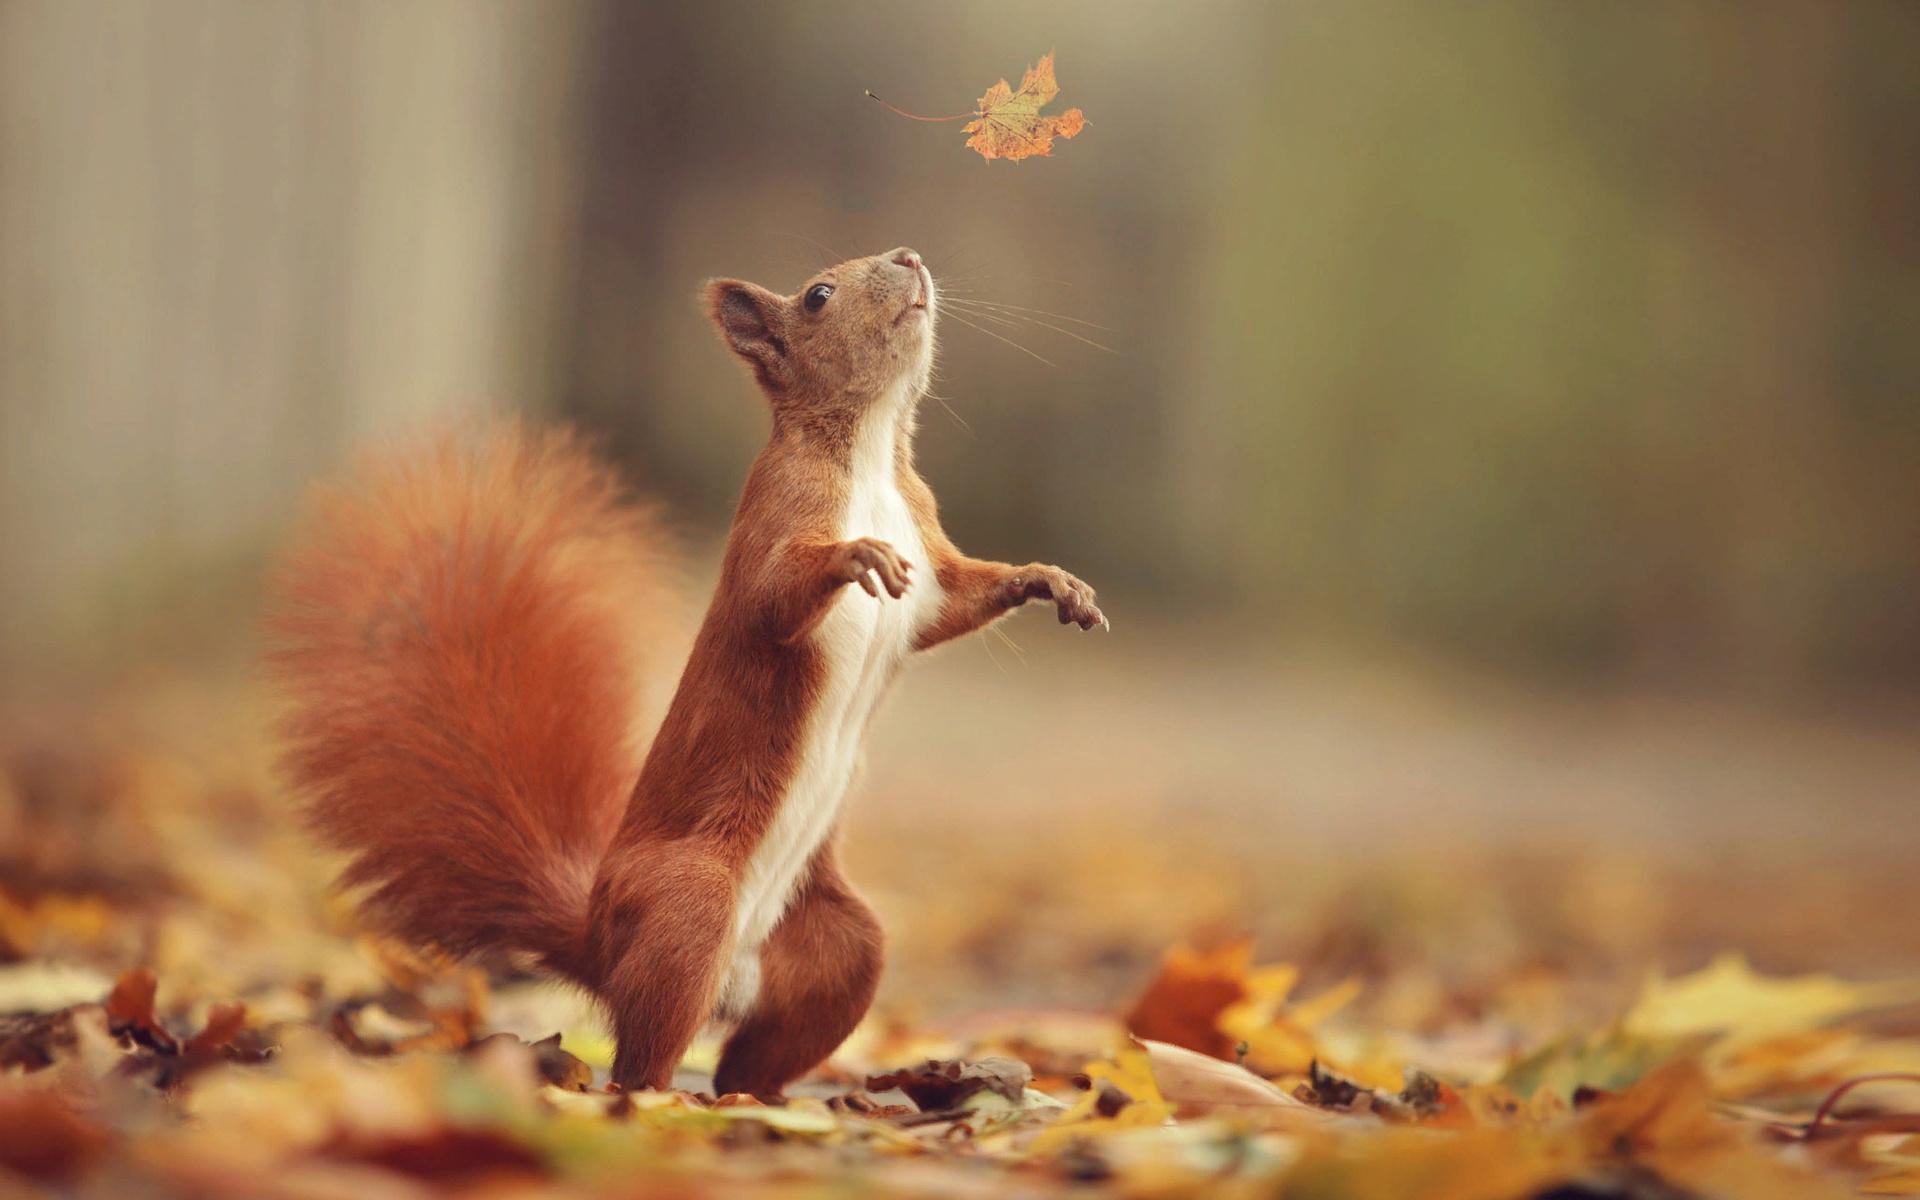 ahmed hanjoul, животное, грызун, зверёк, белка, стойка, природа, осень, лист